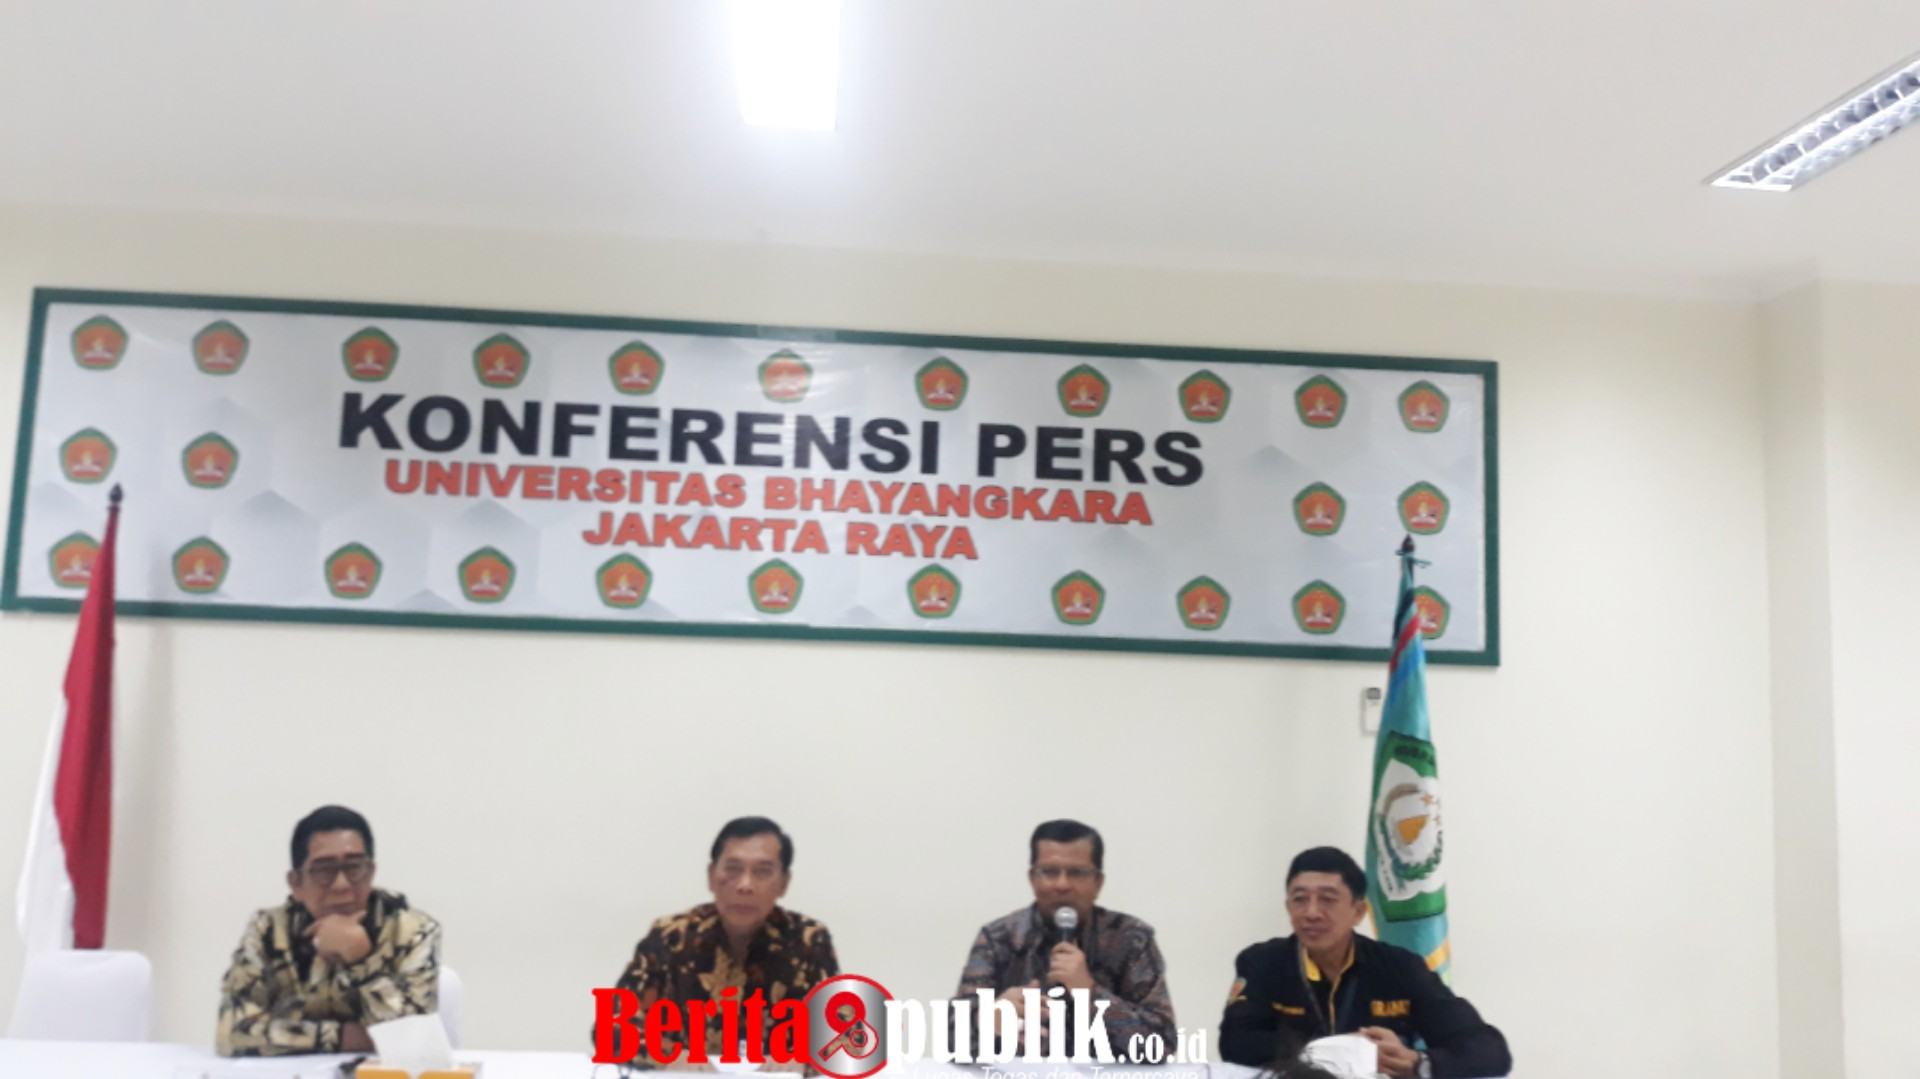 Rektor Universitas Kampus Bhayangkara Jakarta Raya Bambang Karsono (Tengah)Saat Memberikan Keterangan Kepada Awak Media.